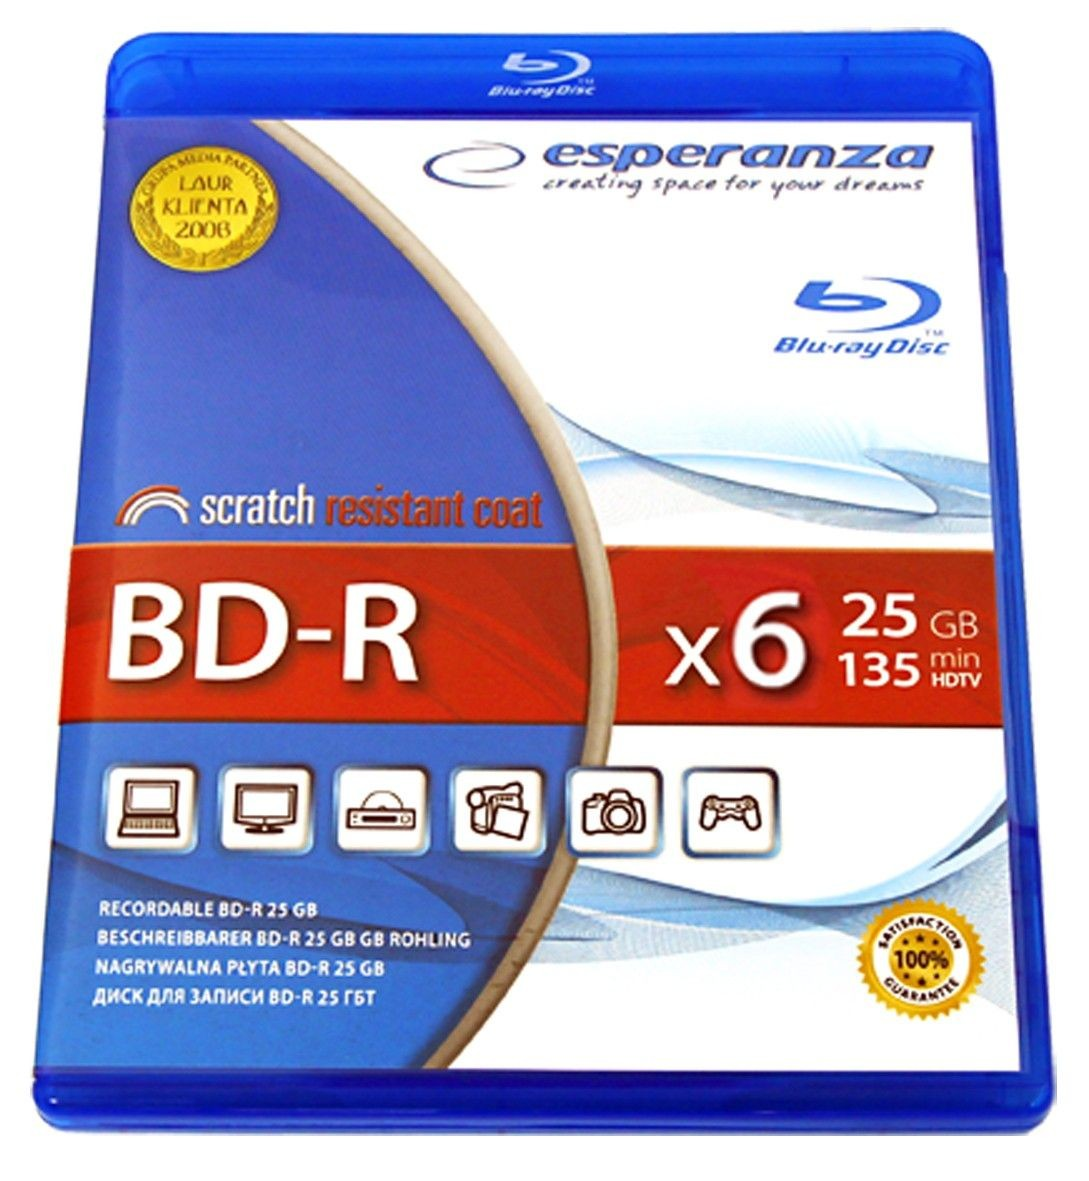 Esperanza BD-R 25GB x4 (BR case, 1szt)